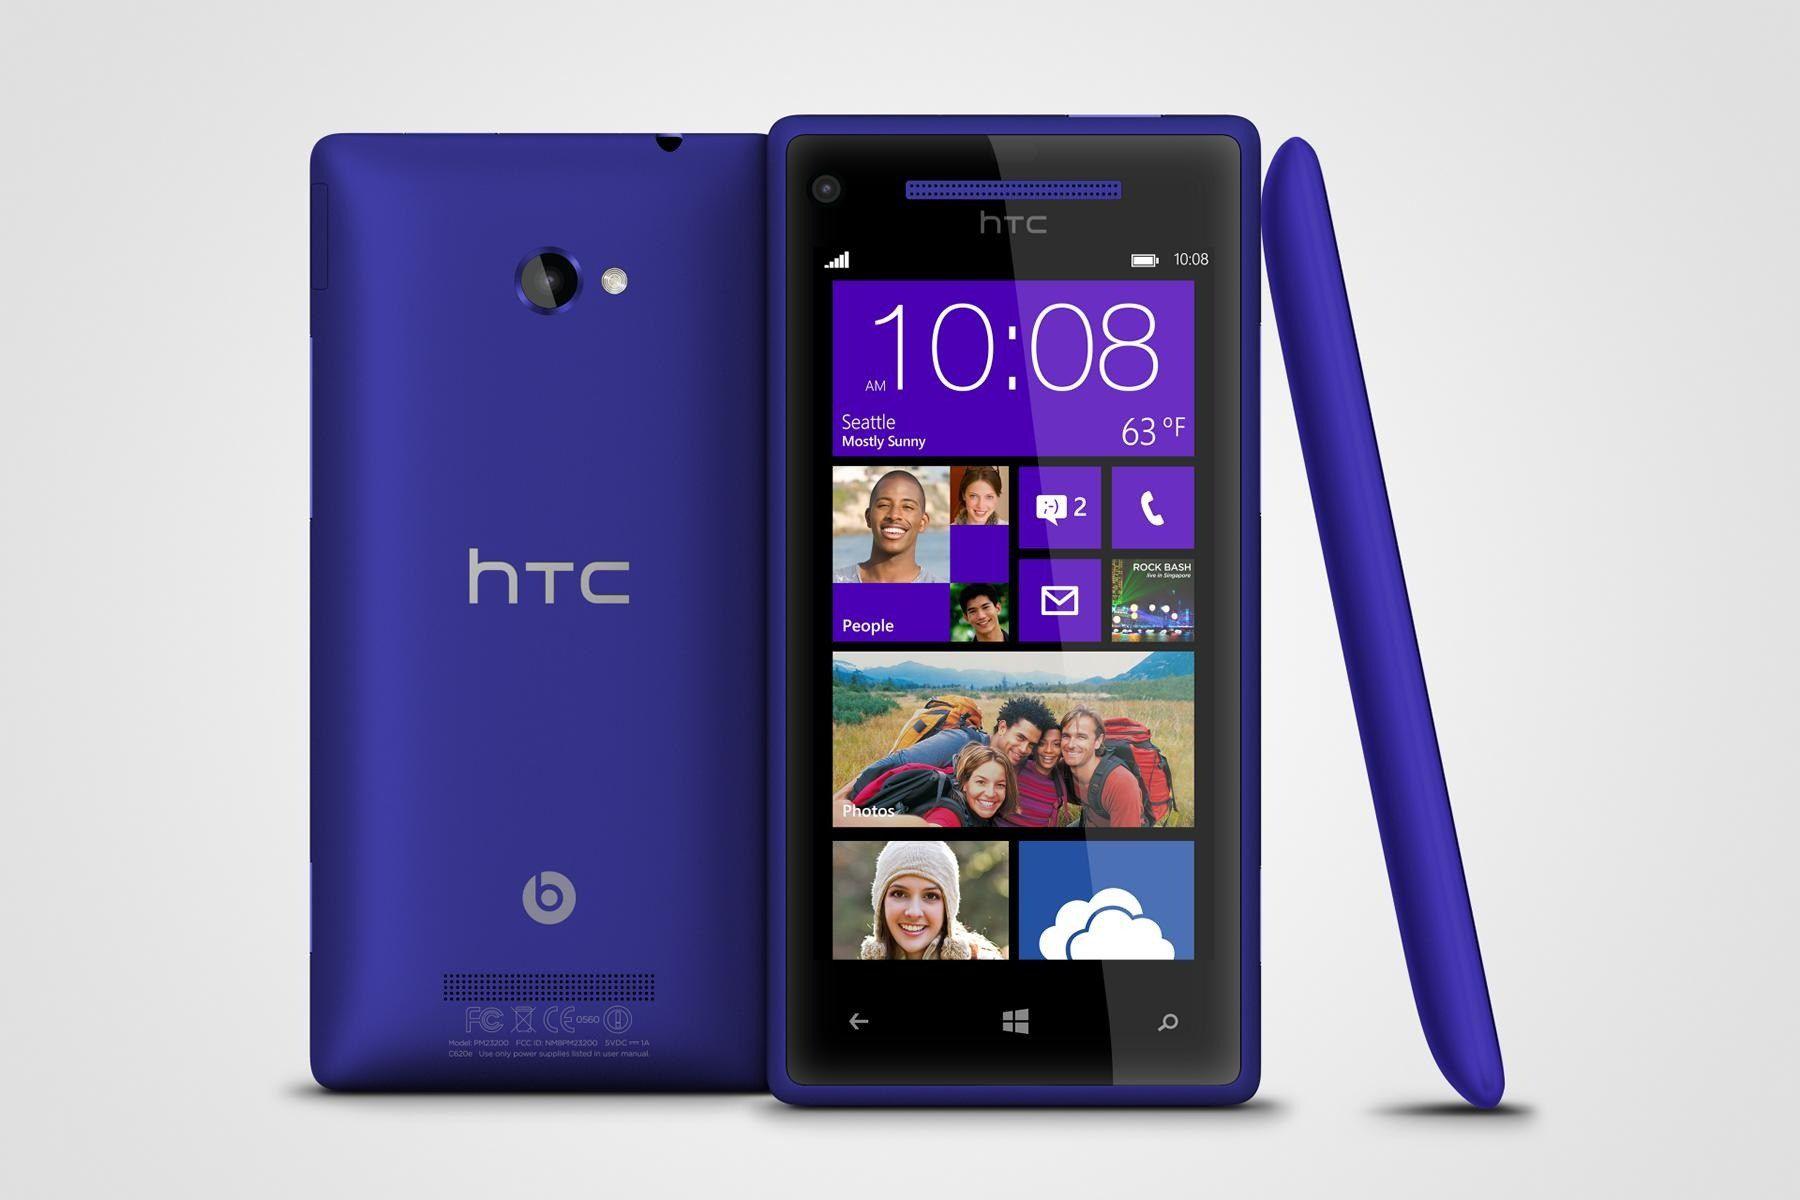 Windows-Phone-8-Topmodelle-1353262428-0-0-80.jpg?nocache=1367608563892